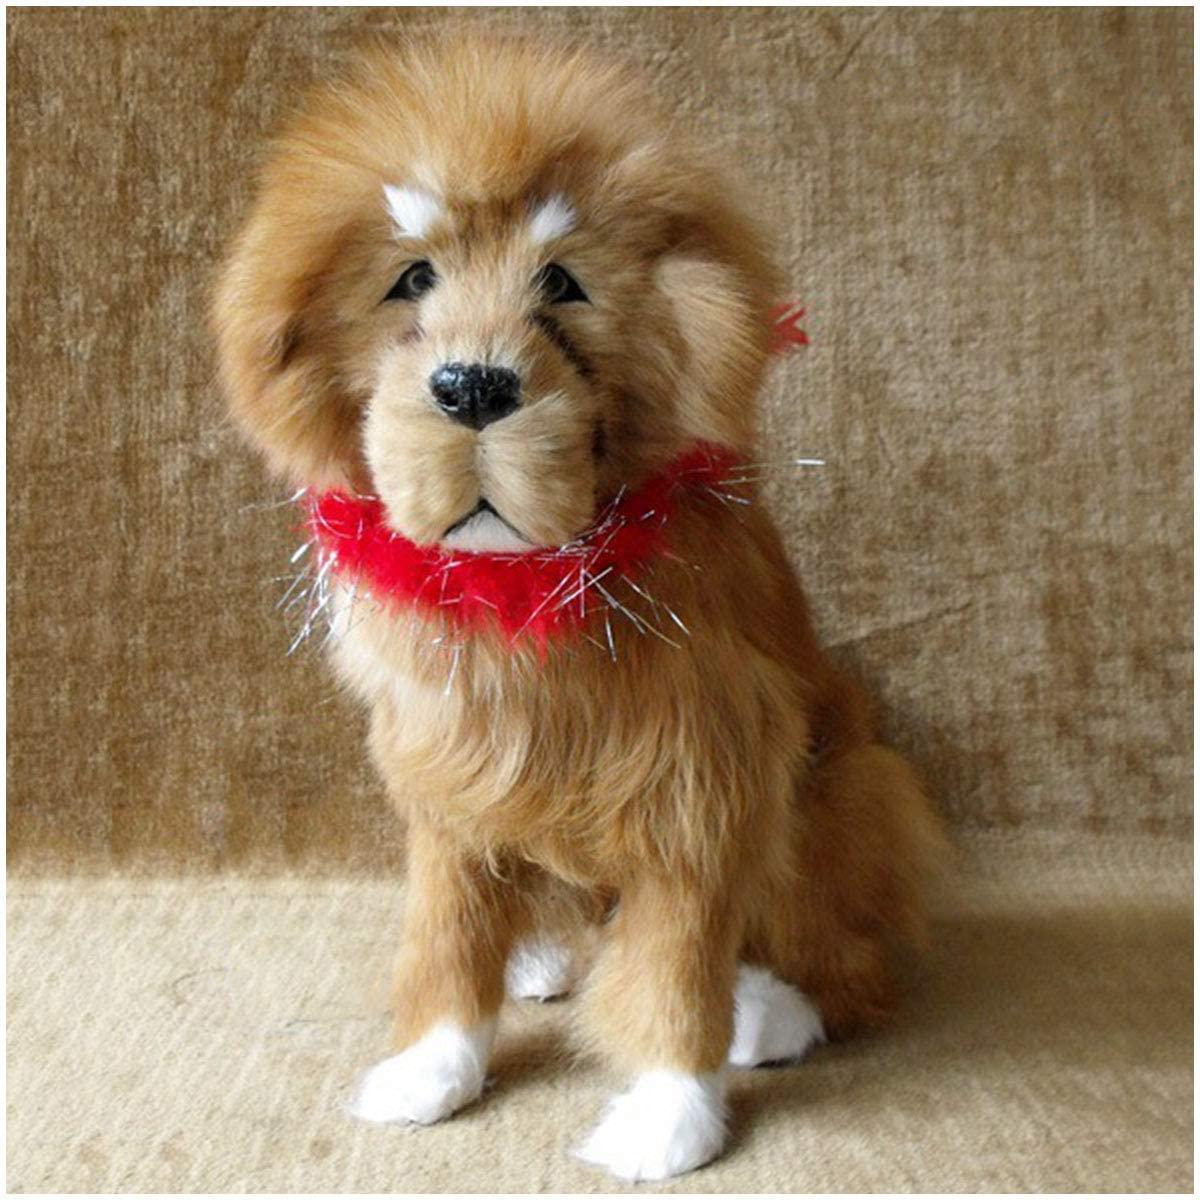 LXX Simulation Tibetan Mastiff Model - Simulated Animal Model Lifelike Dog Comfortable Handcraft - Tibetan Mastiff Figurine Toy - for Home Decoration Wedding Kids Birthday Gift